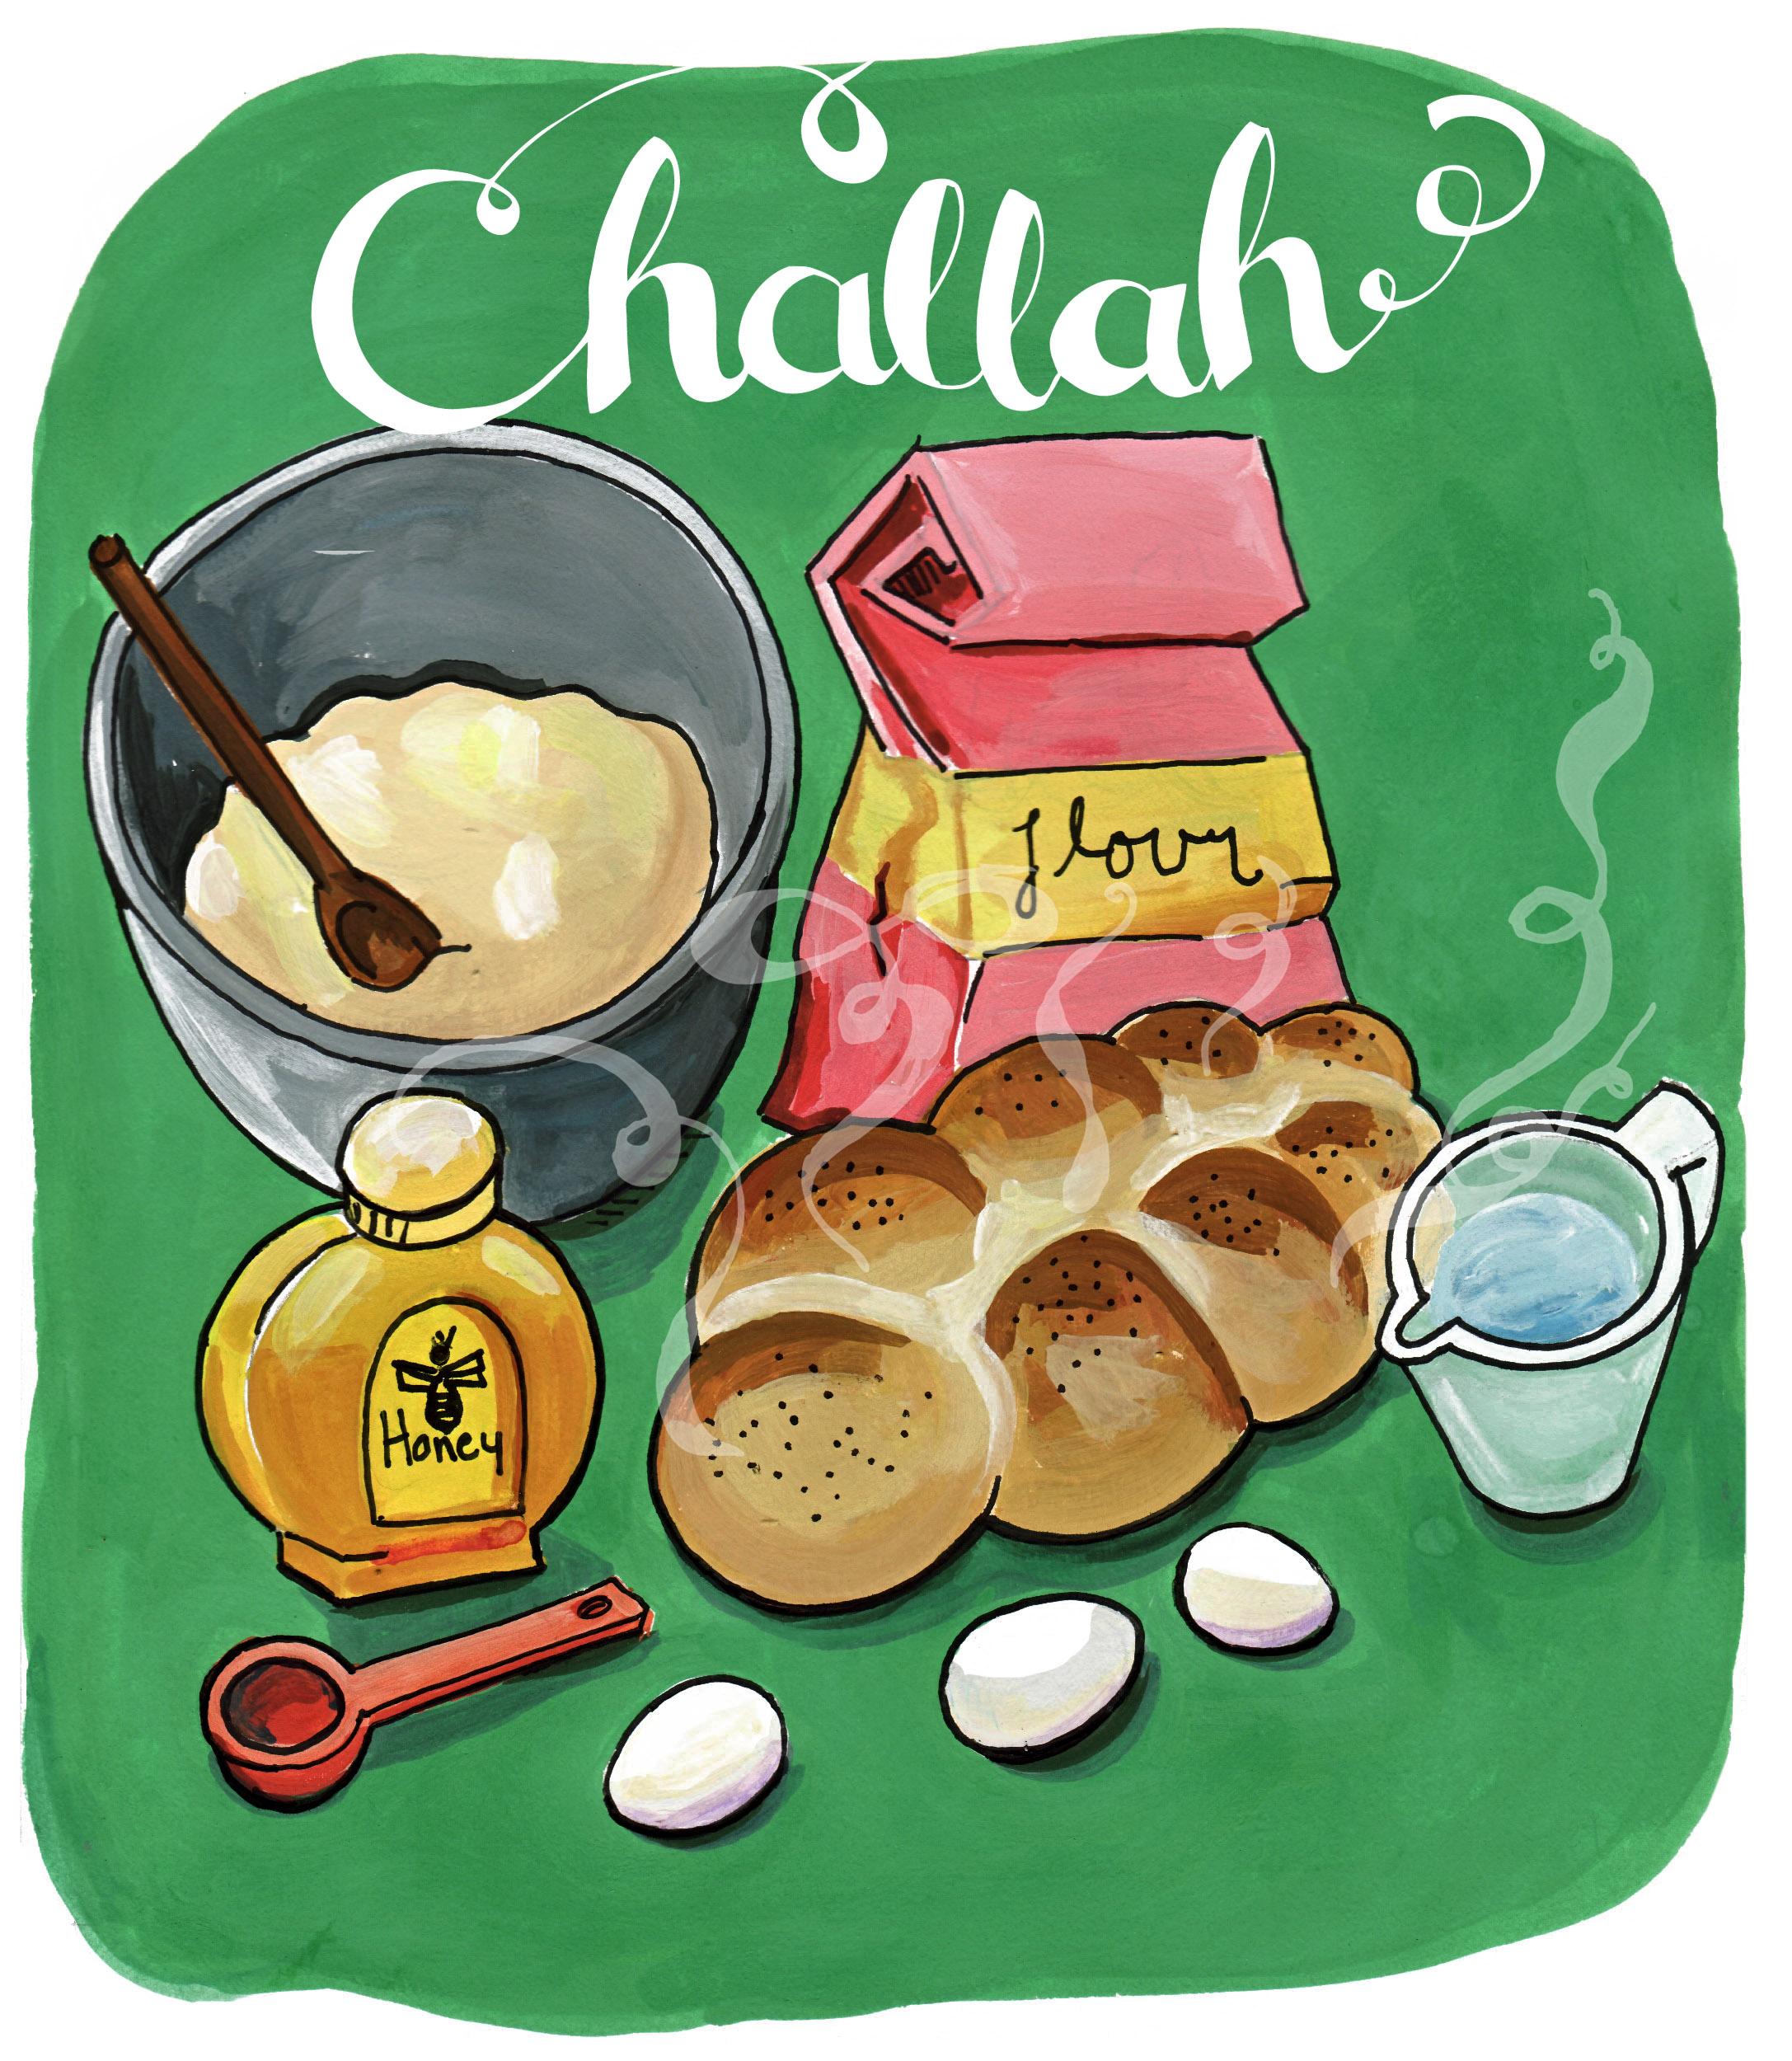 Bread clipart yeast bread. Shabbat illustrated bites challah